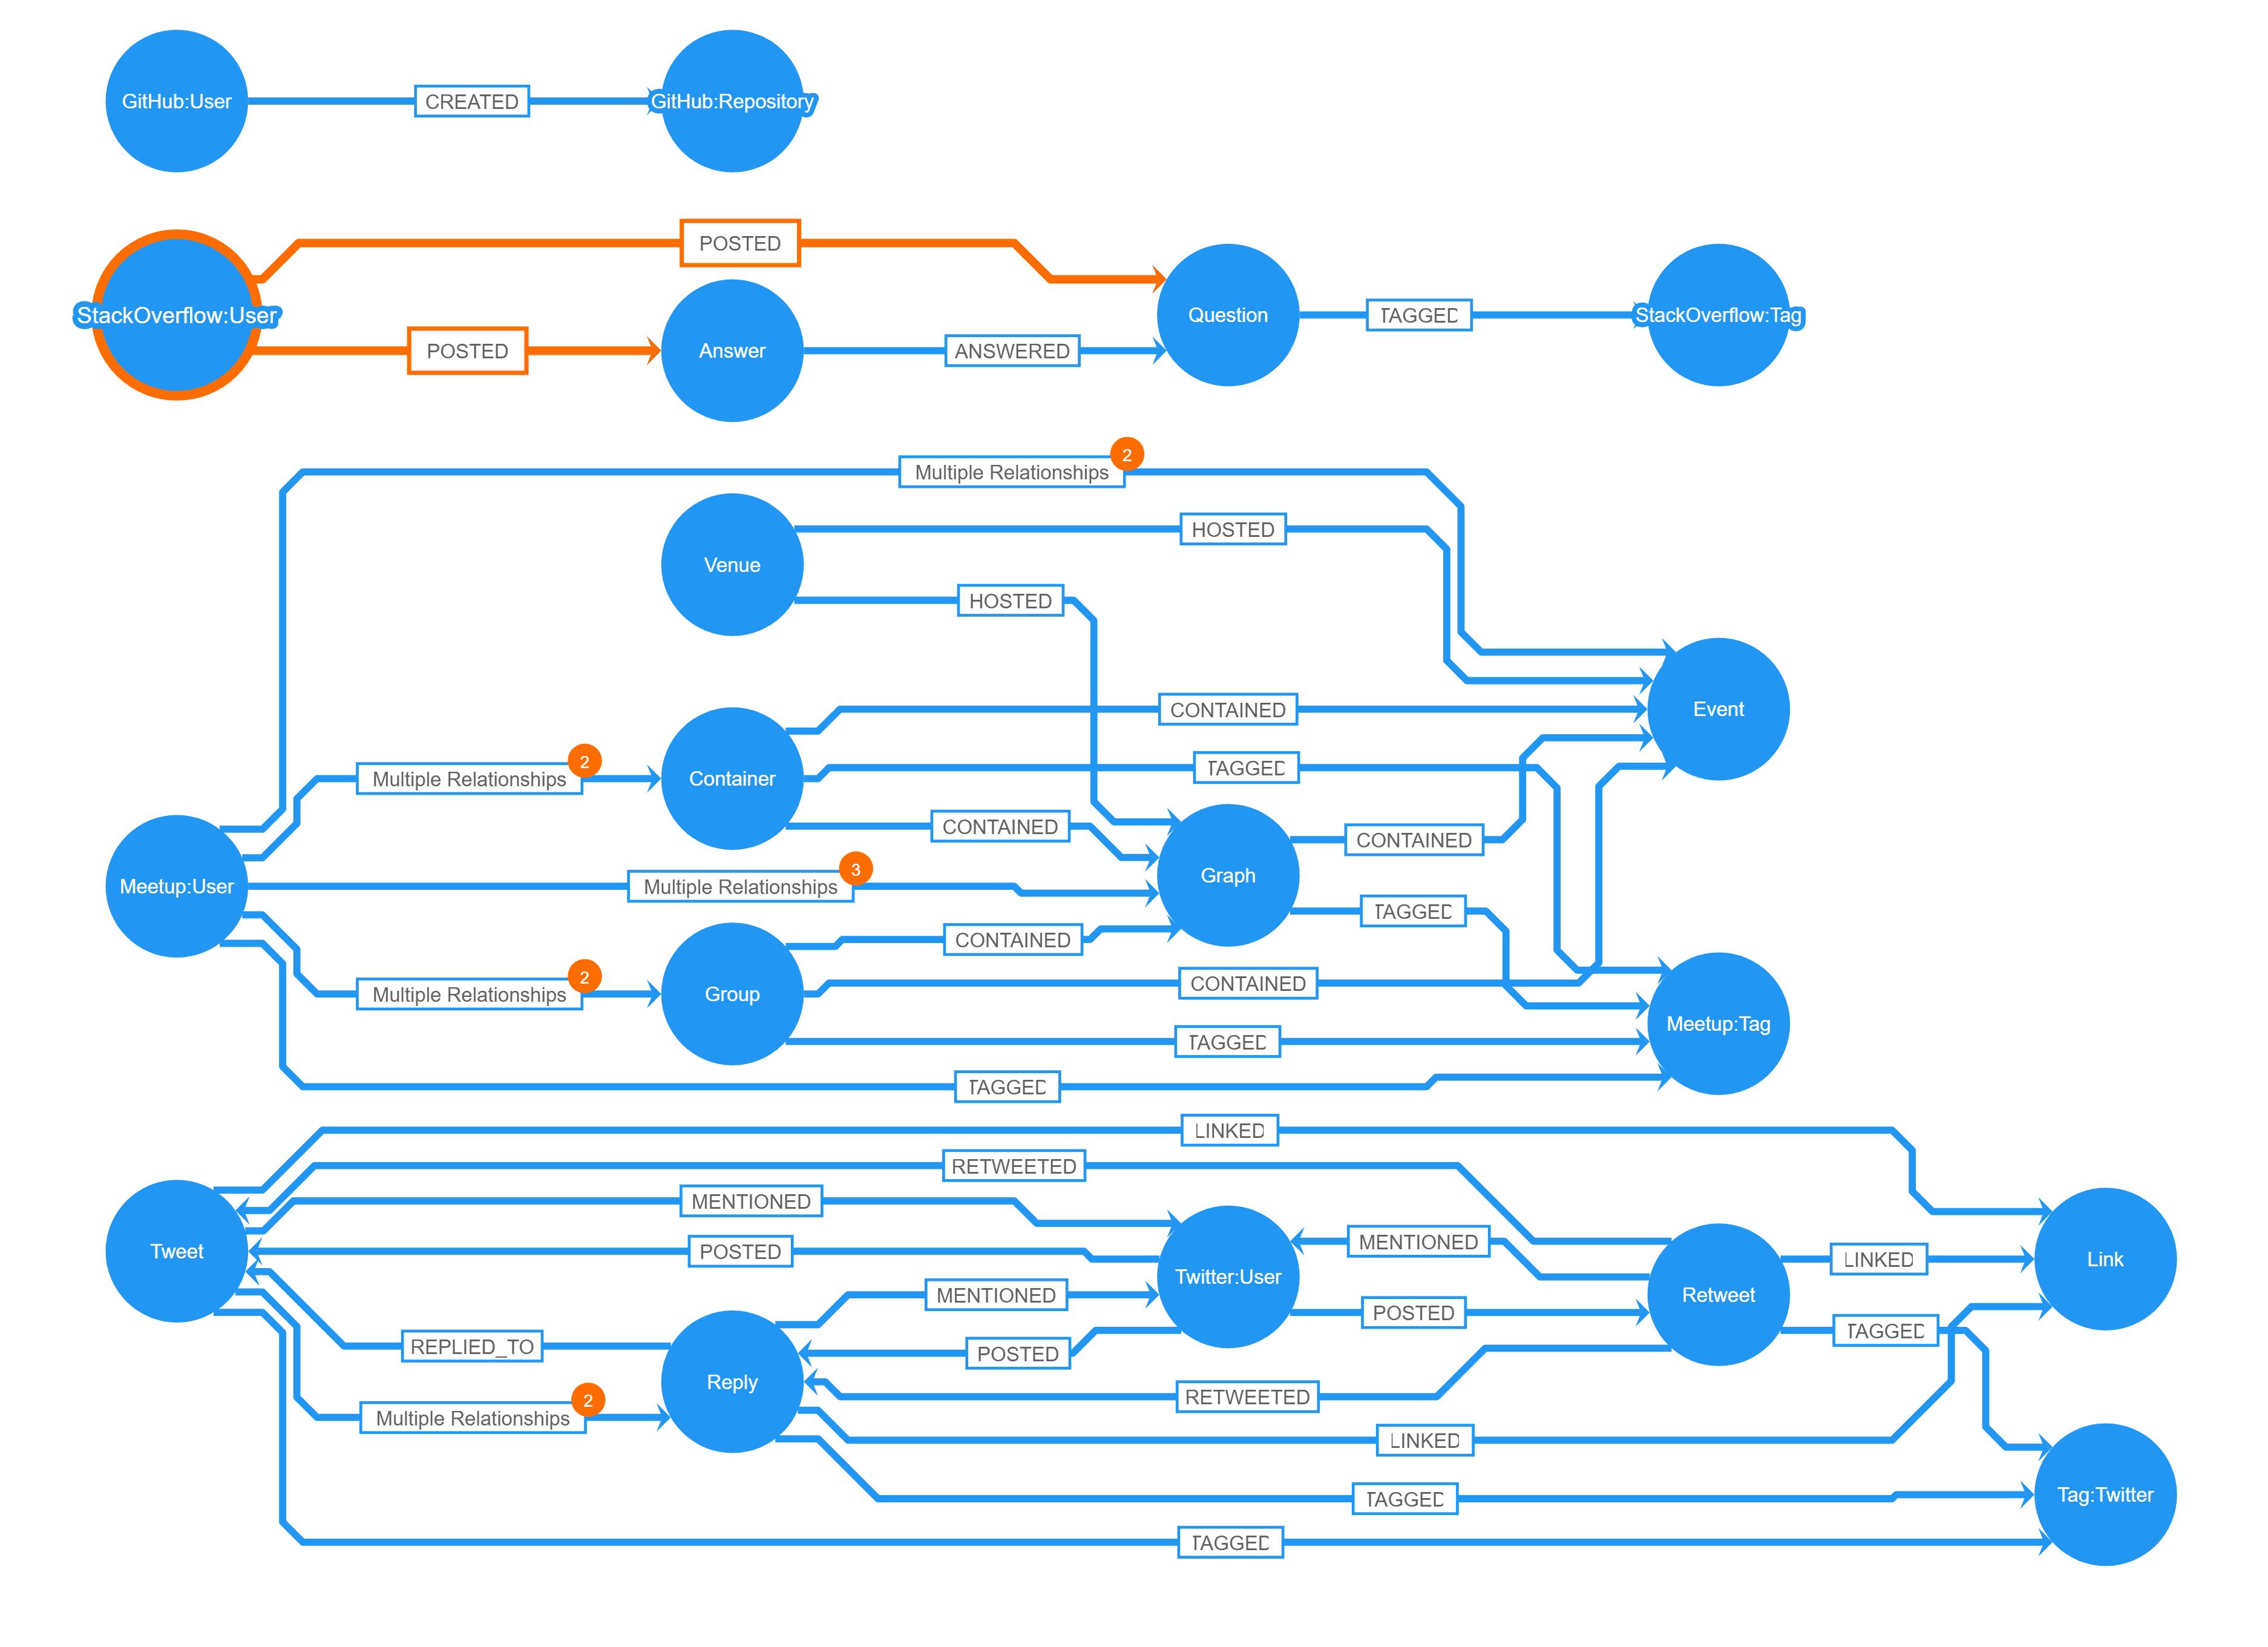 Graph Visualization For Neo4j Schemas Using Yfiles